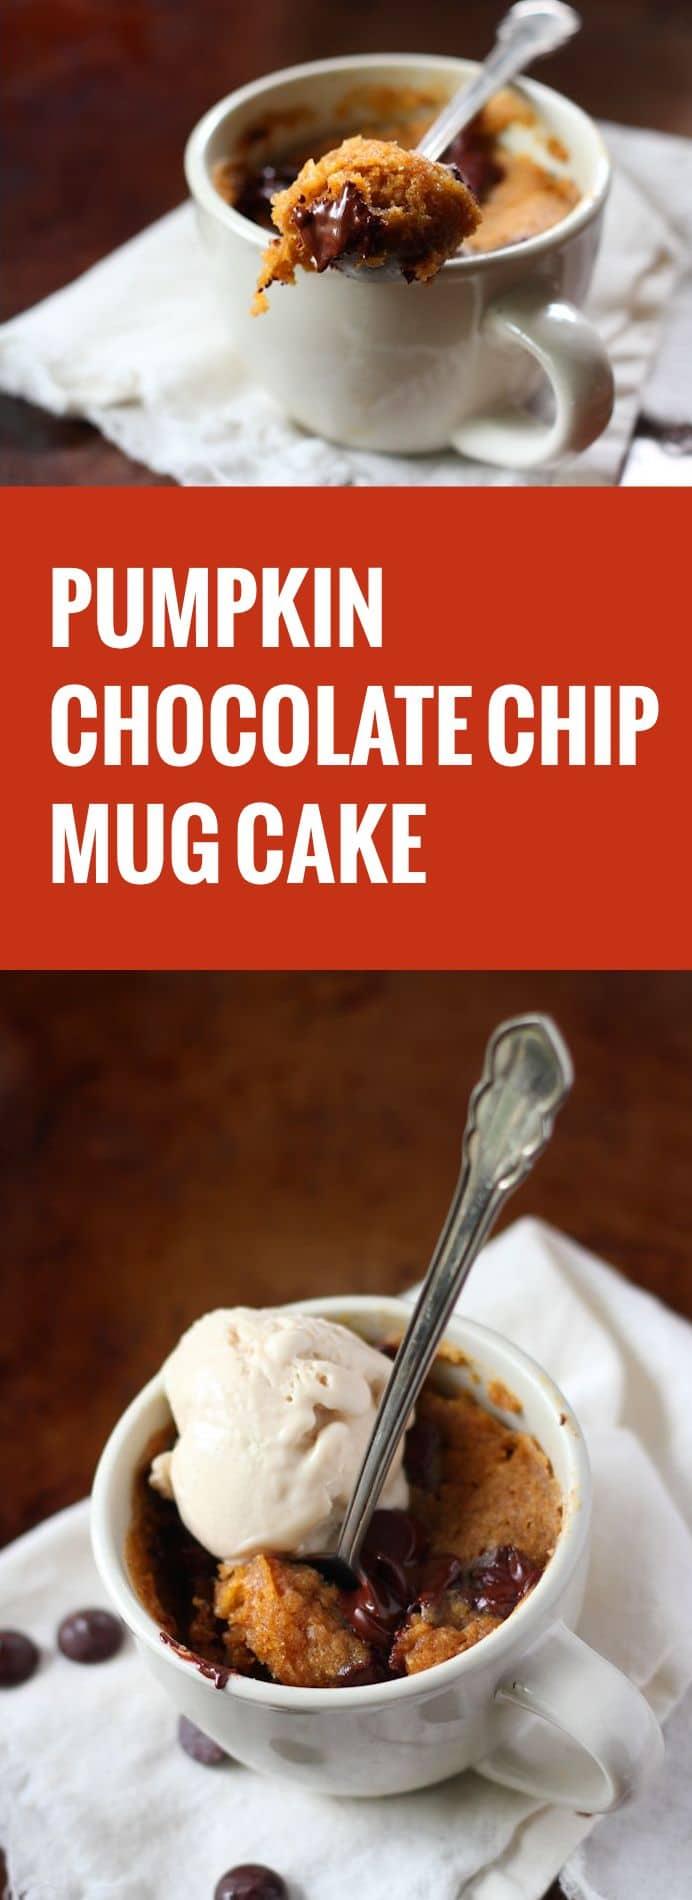 Chocolate Chip Pumpkin Mug Cake - Connoisseurus Veg